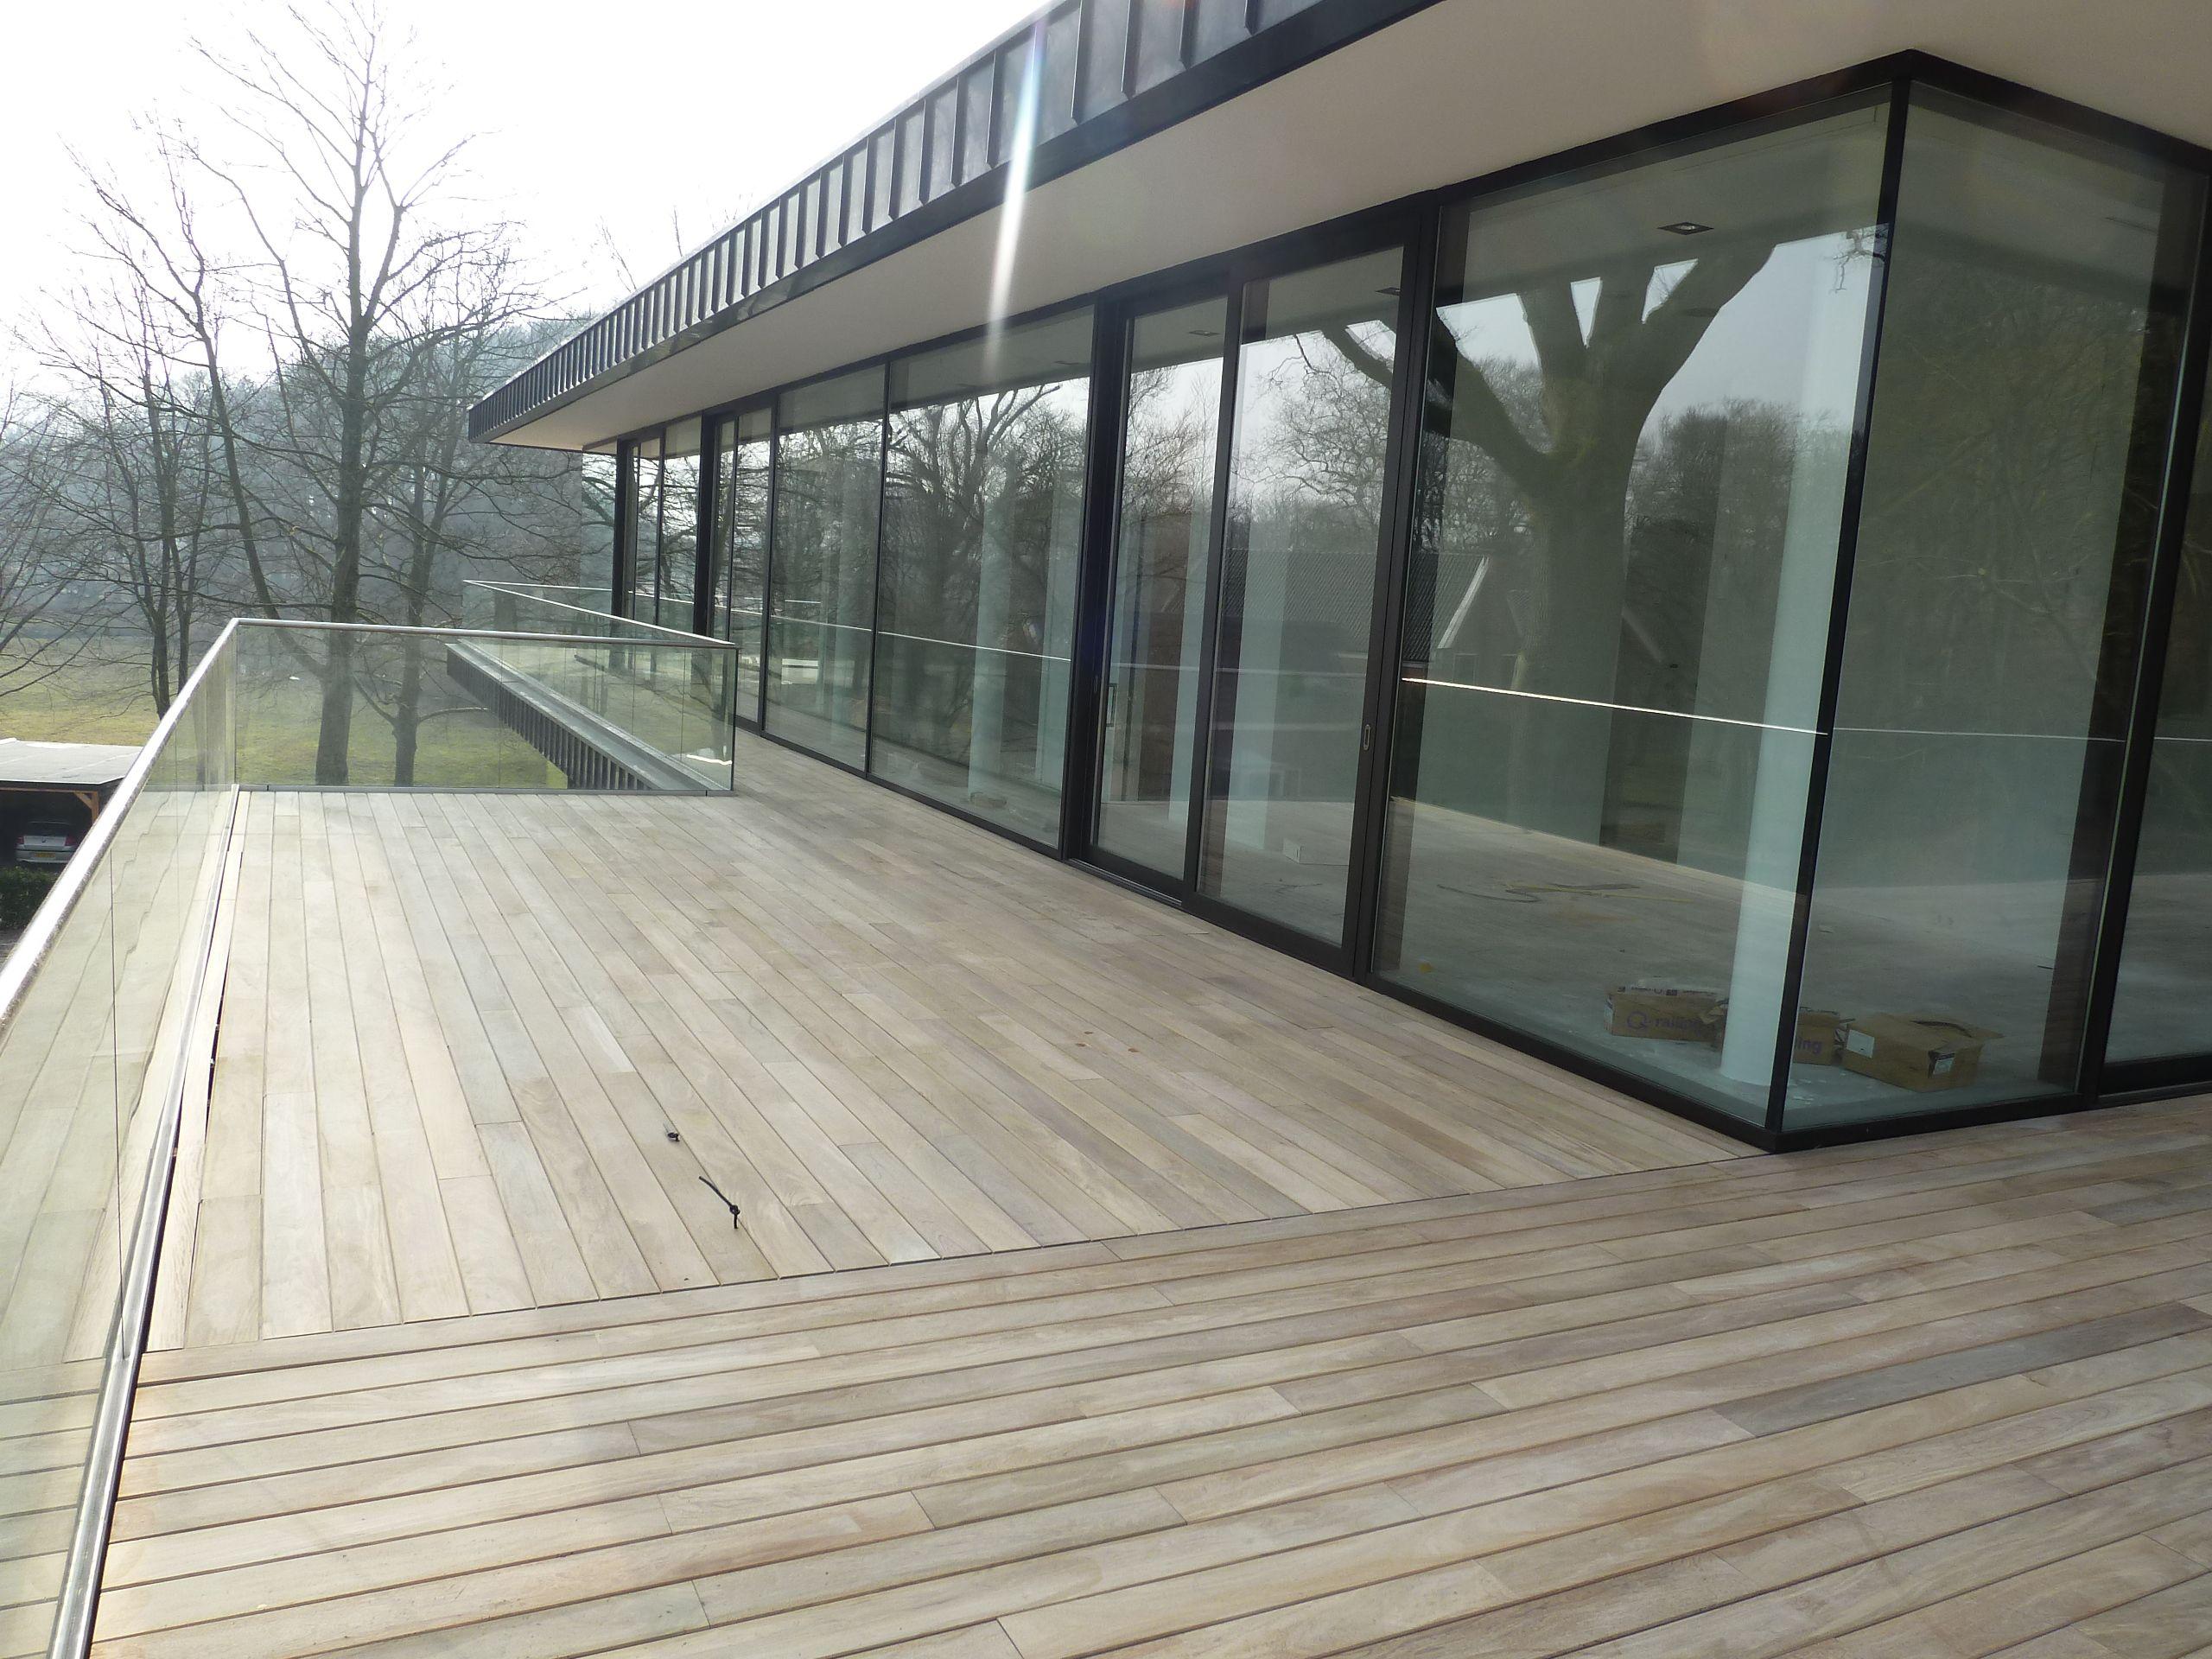 Exterpark plus terras hout taperyba 21 x 130 mm onbehandeld inmiddels geinstalleerd op - Terras hout ...